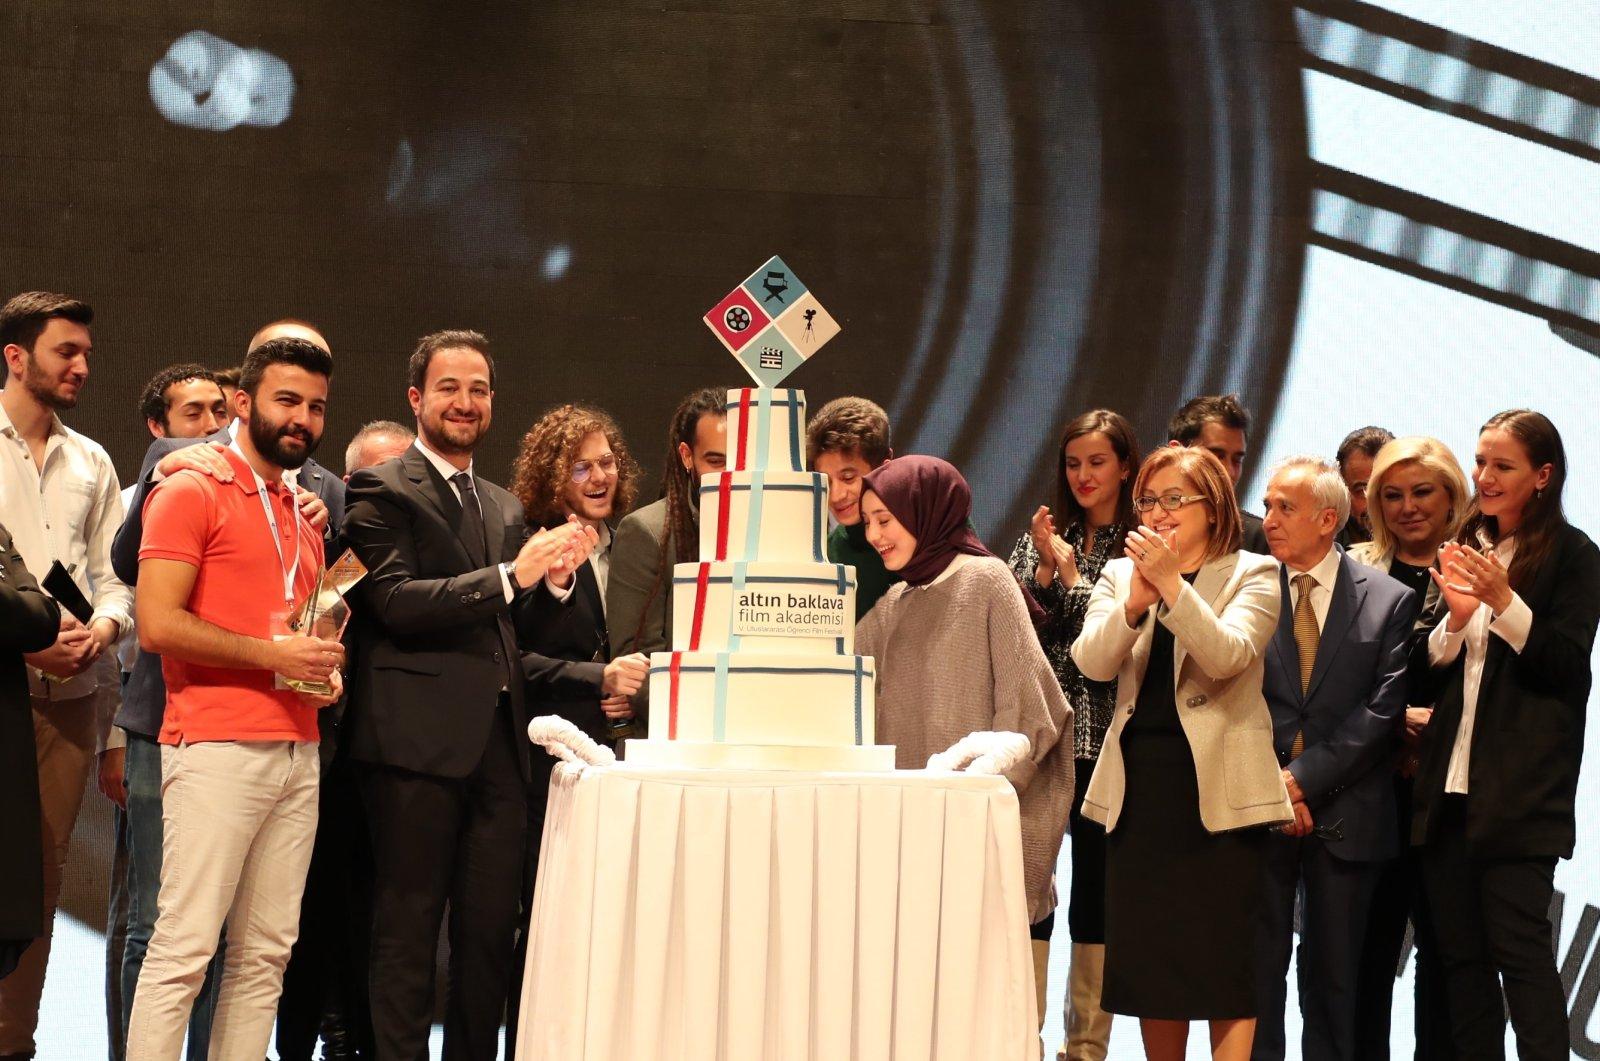 Winners of the Golden Baklava Film Academy Fifth International Student Film Festival cut a cake at the celebration in Gaziantep, southeastern Turkey, 2019.